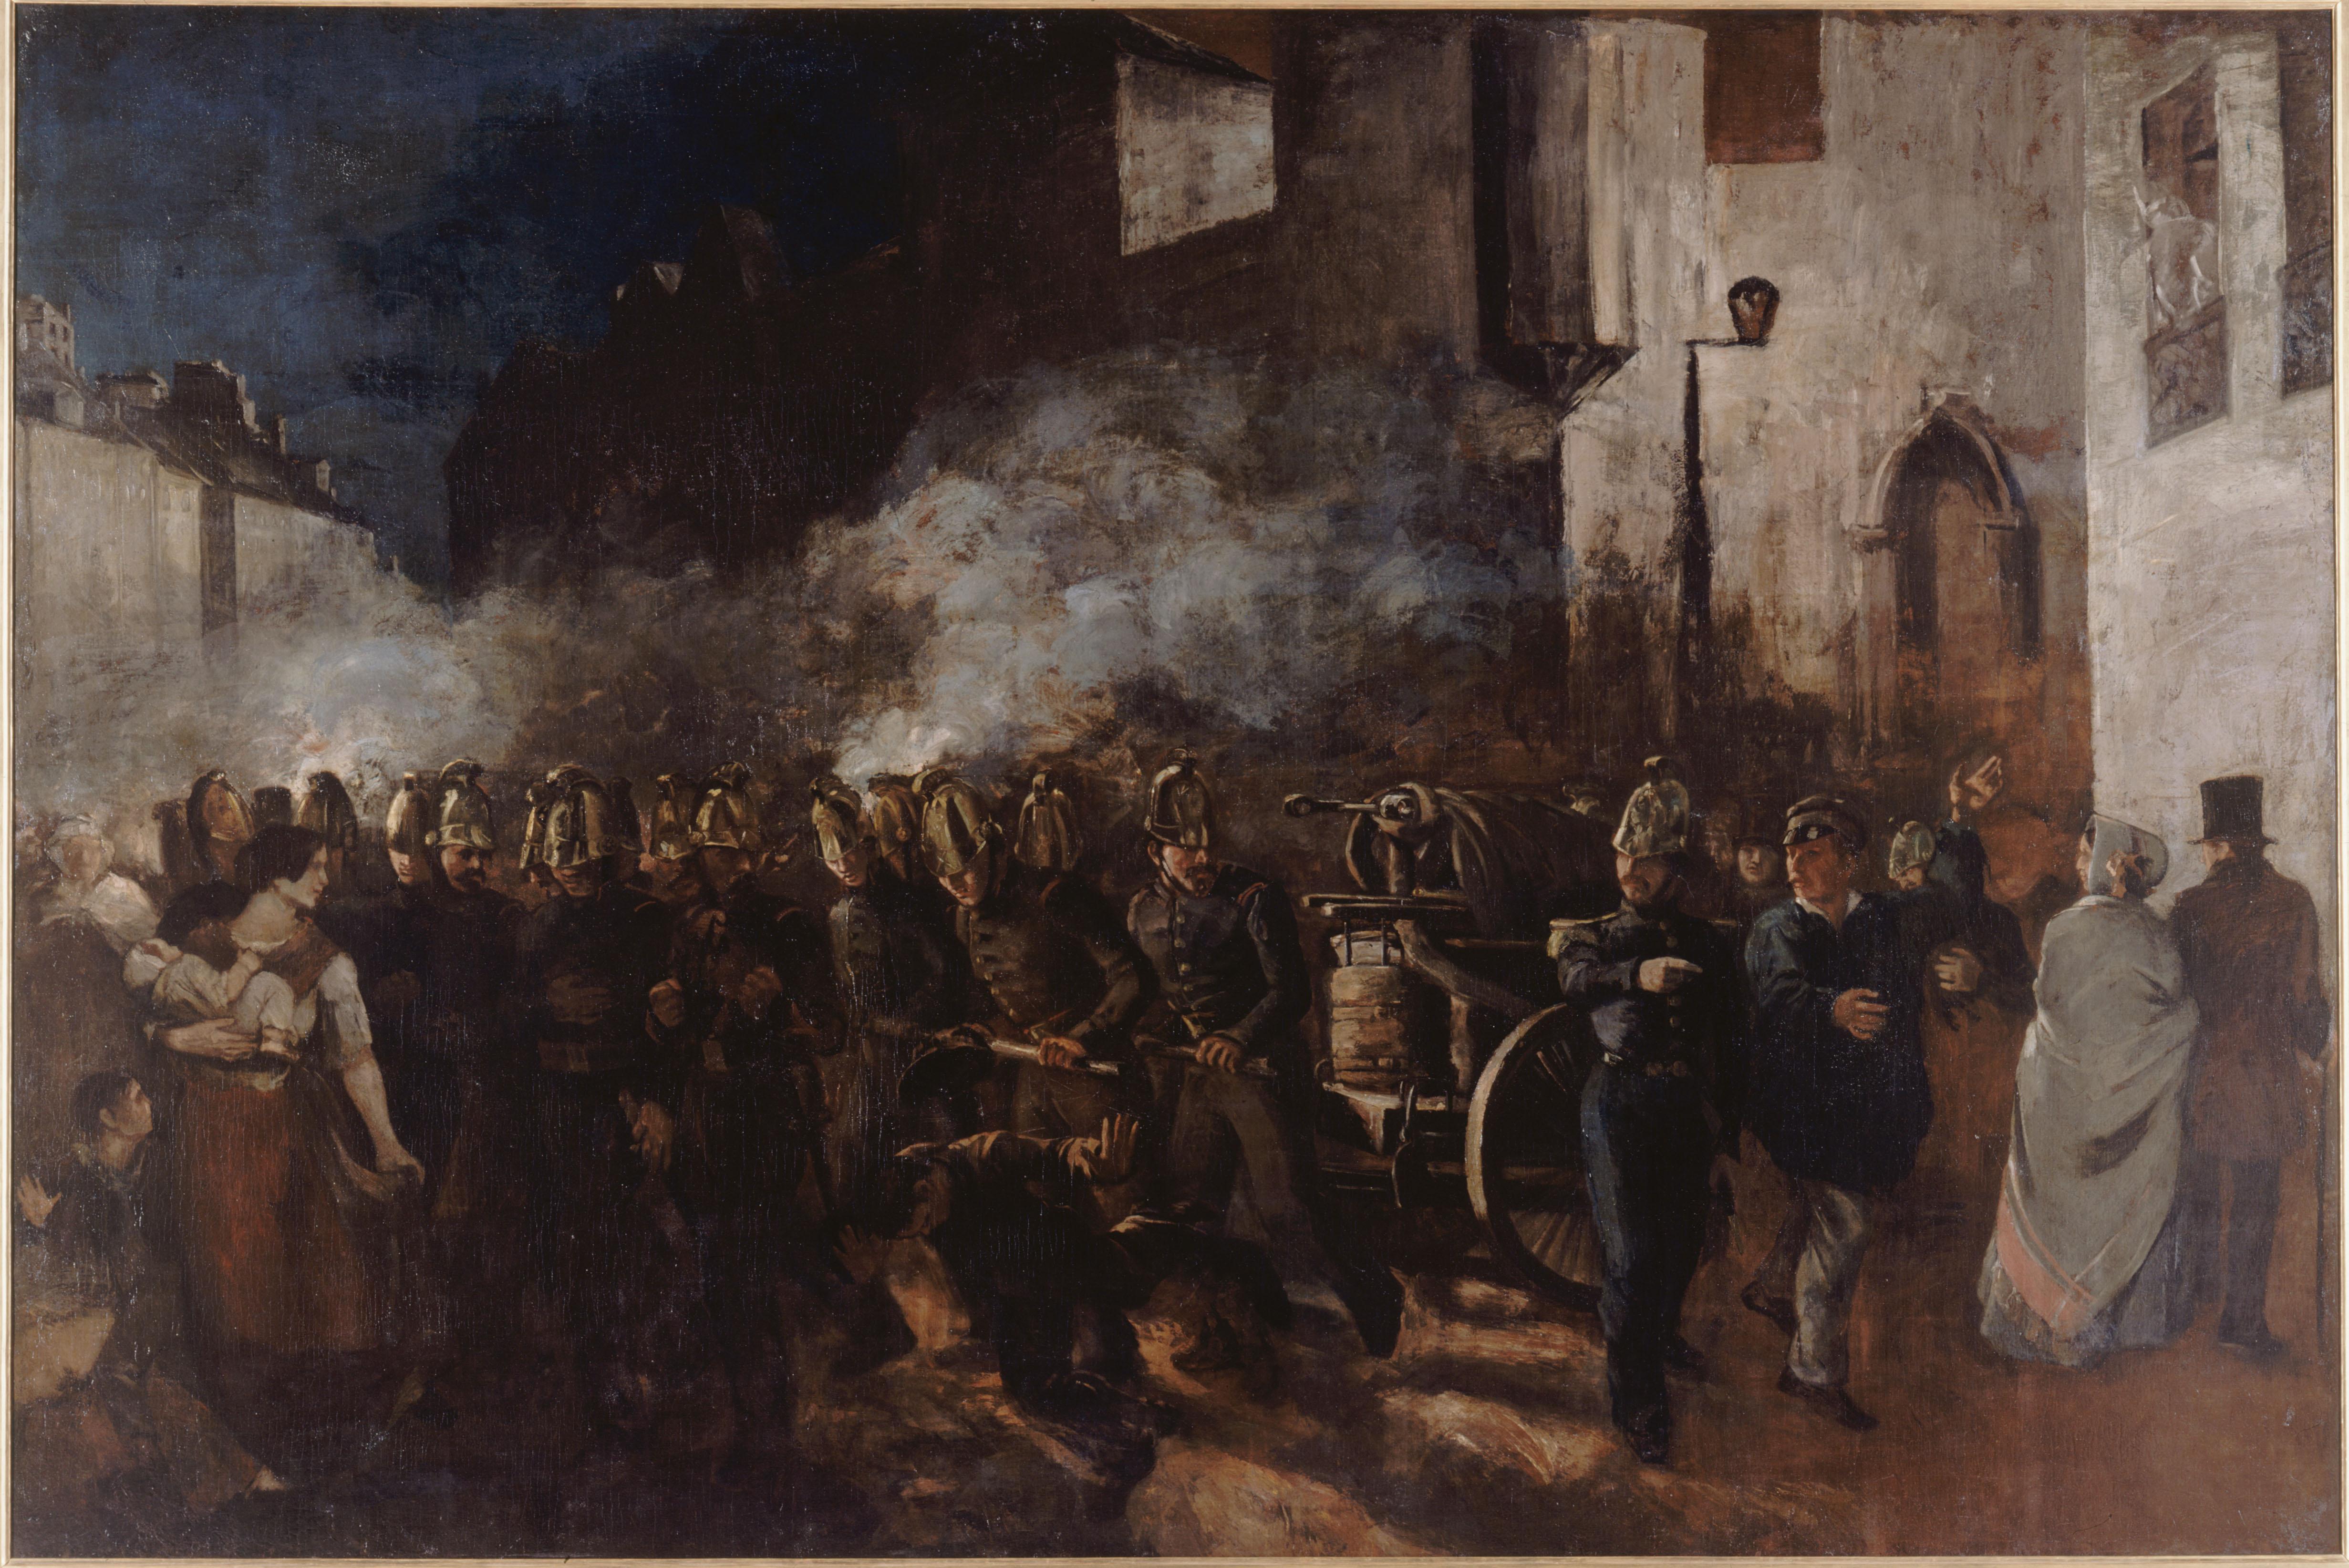 Gustave Courbet - Firemen running to a blaze